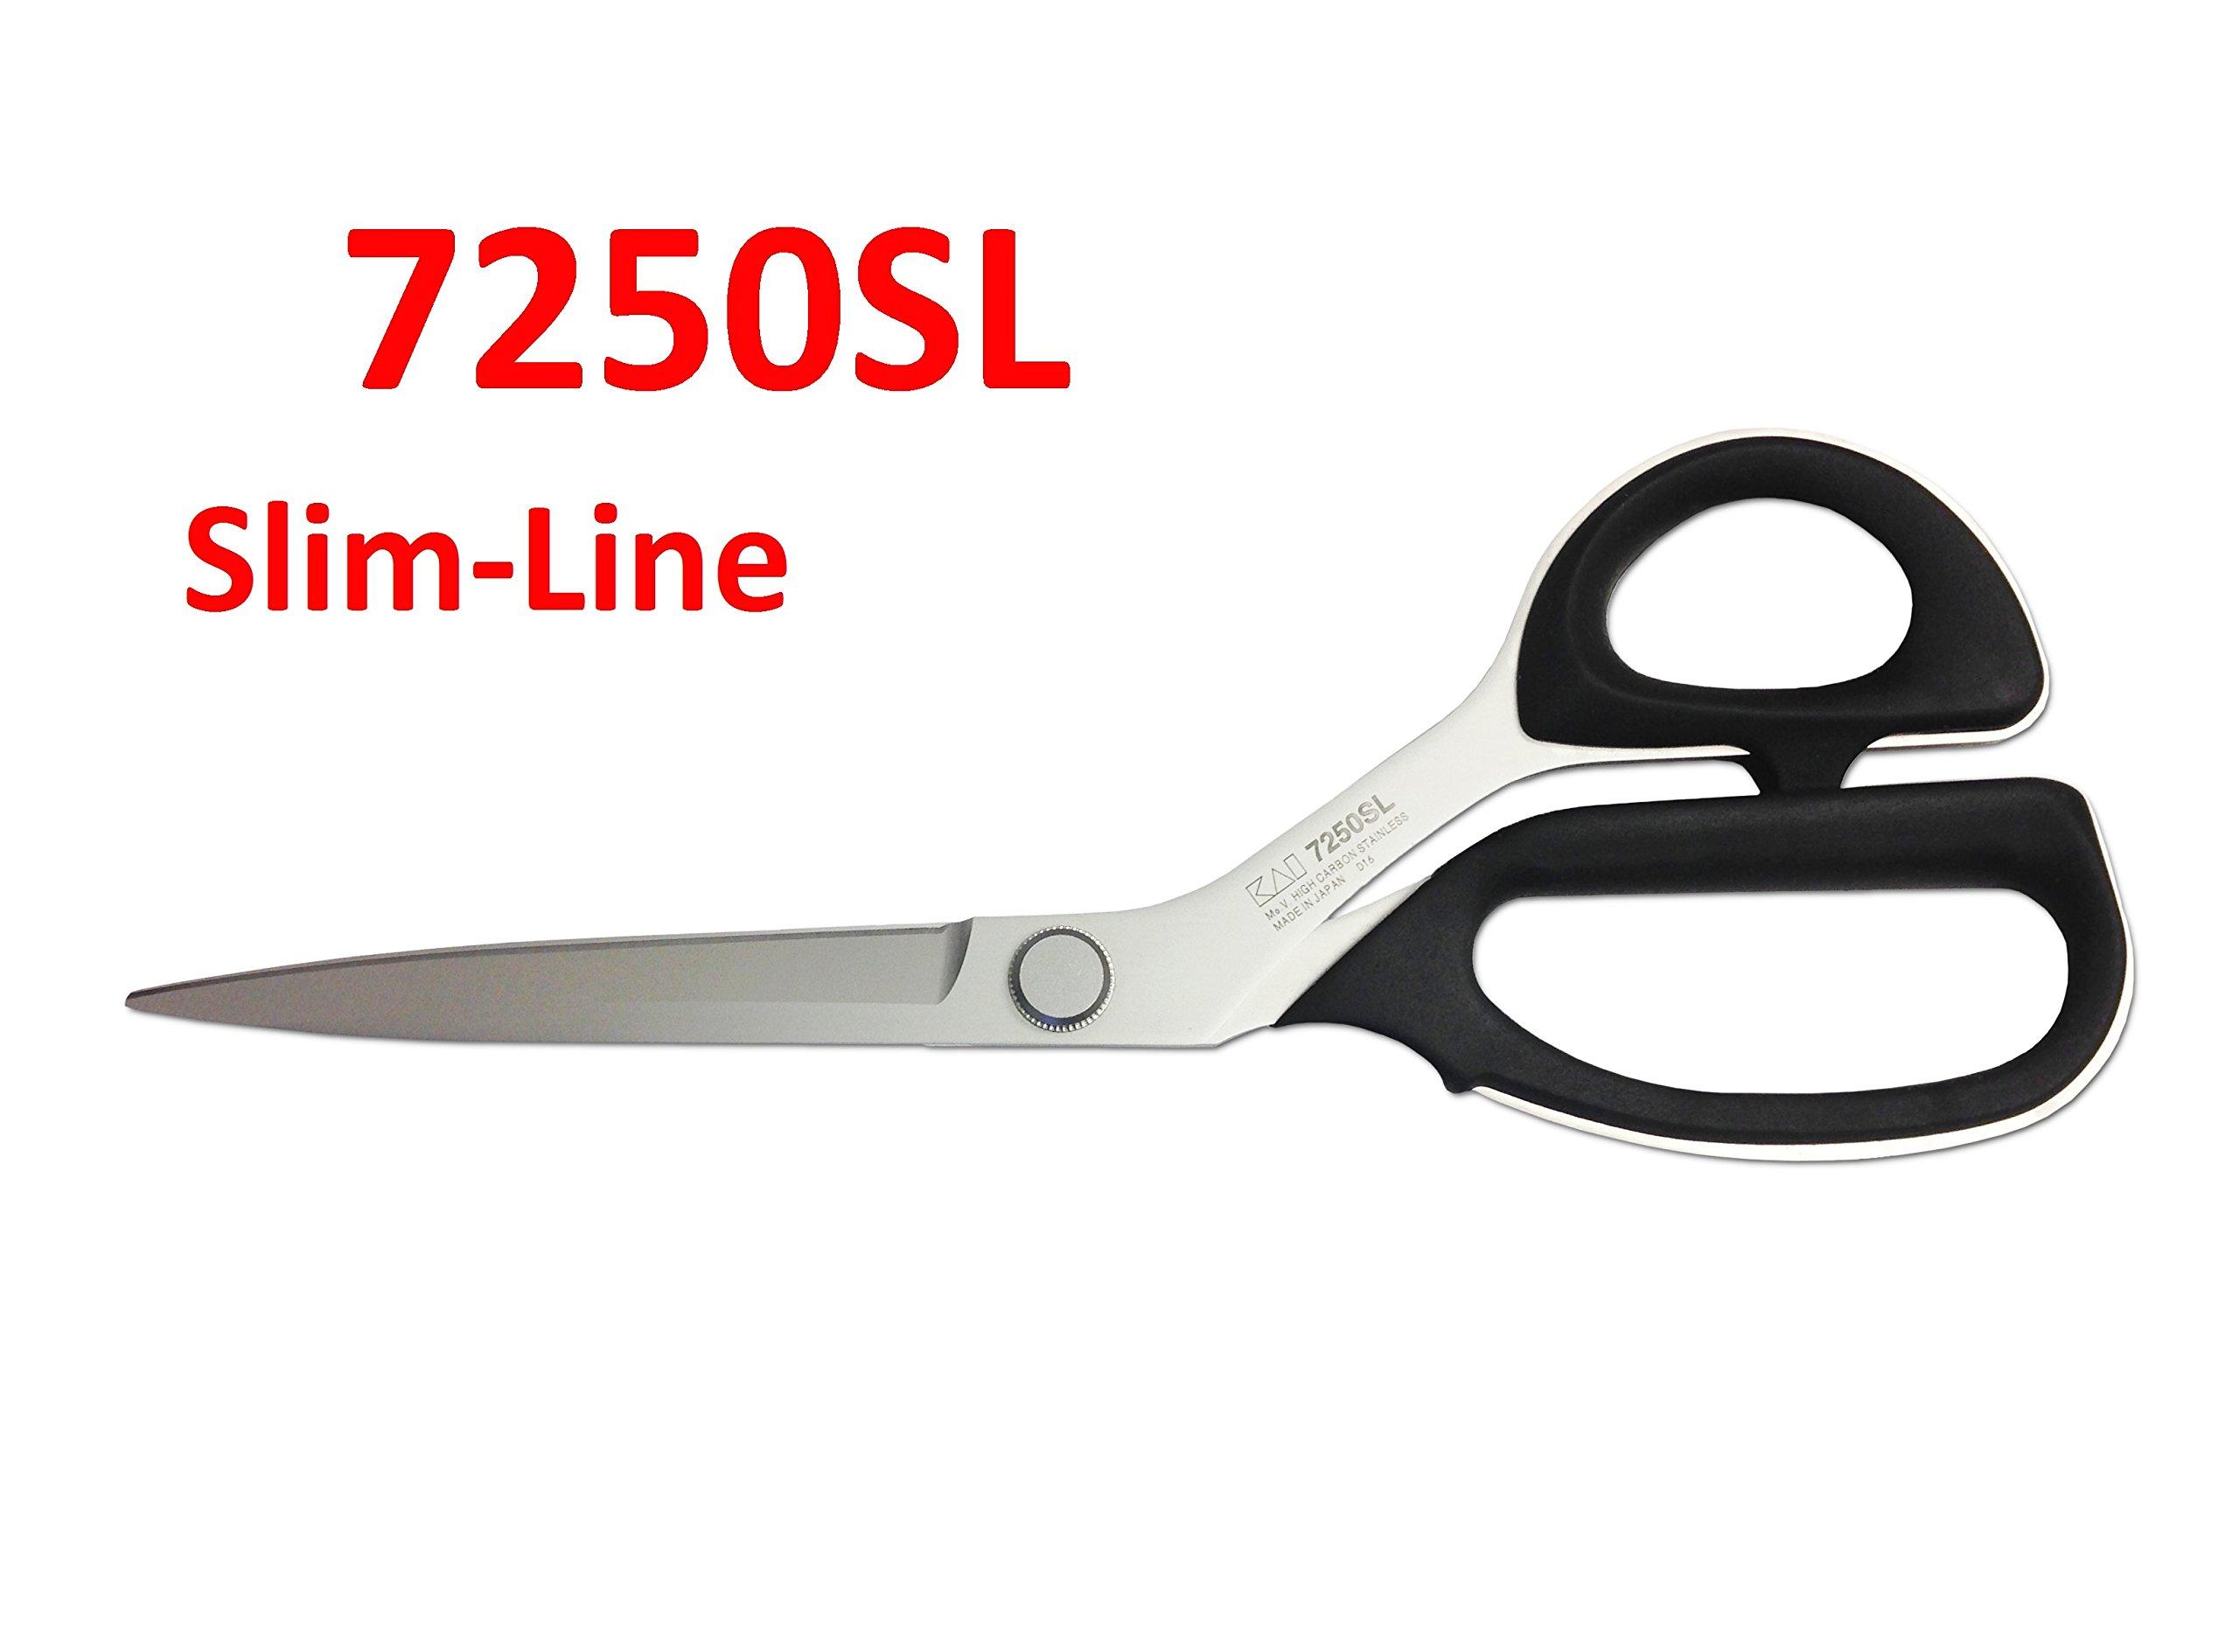 Kai 7250SL 10 Inch Professional Shears (Slim Line) by Kai